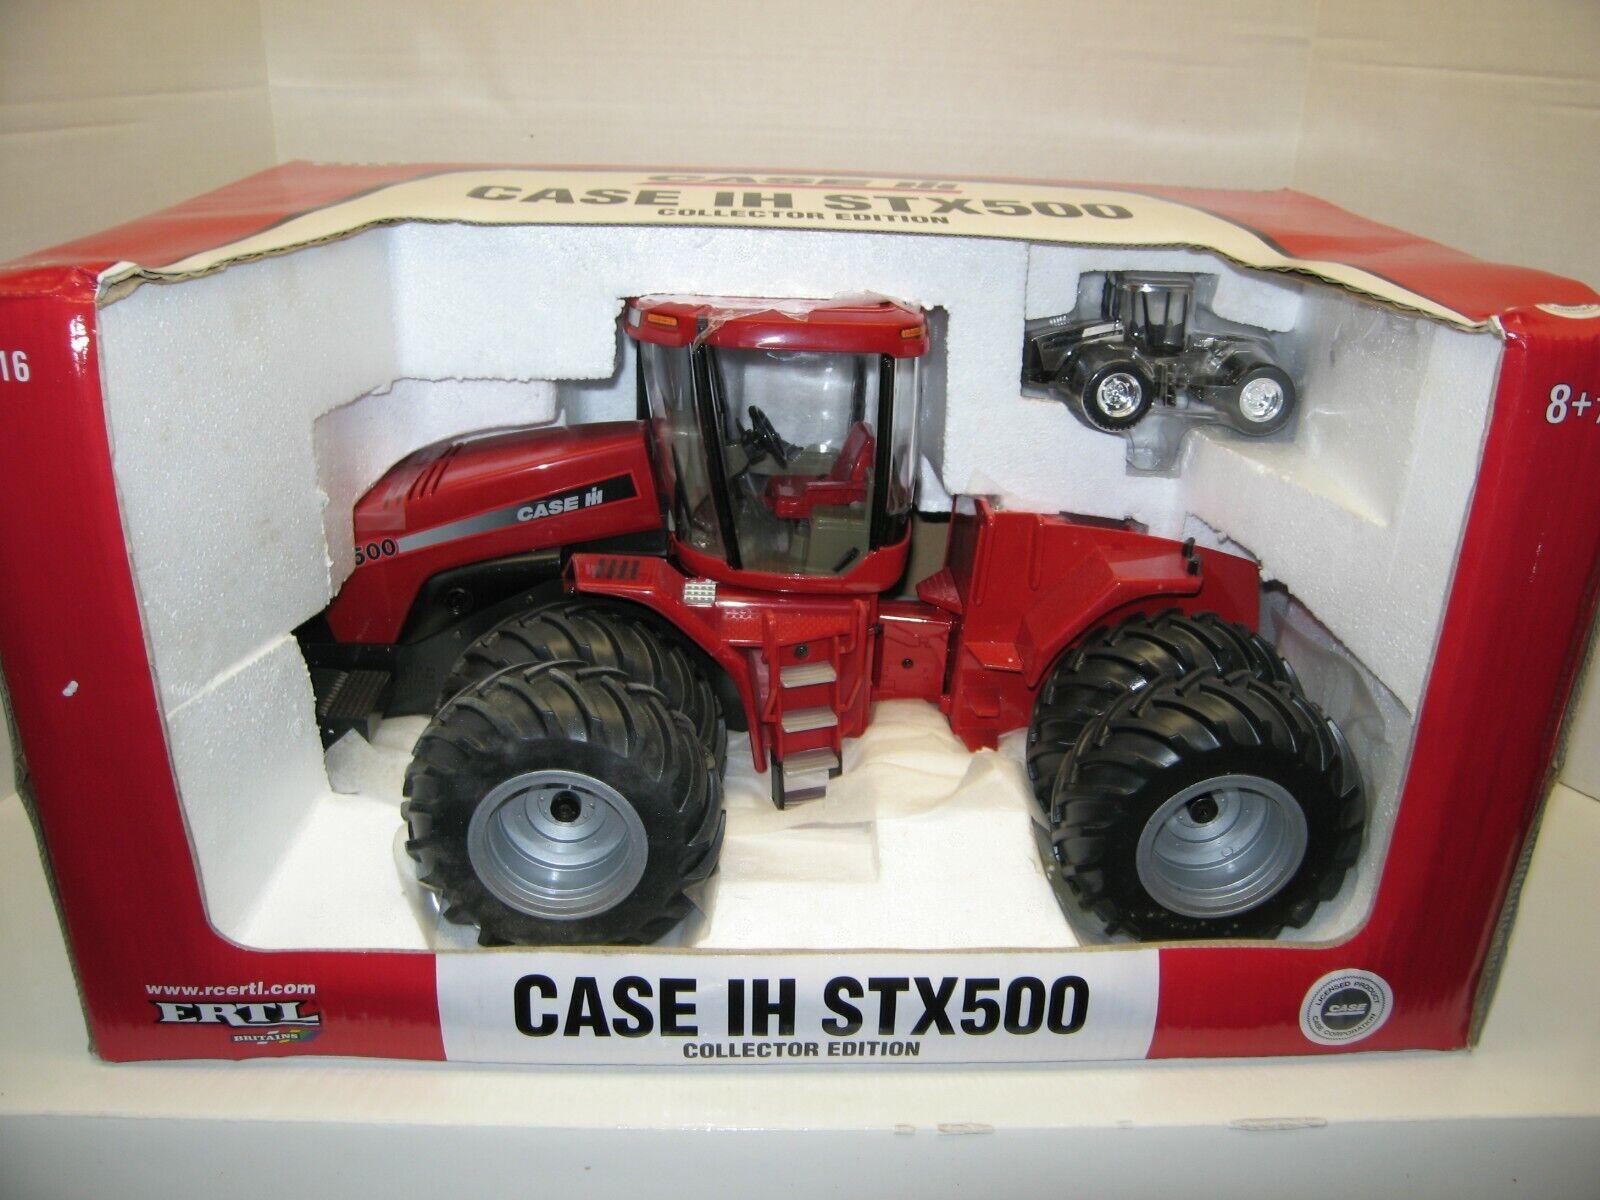 1 16 CASE I-H STX500 COLLECTOR EDITION w  1 64 CHROME NIB free shipping